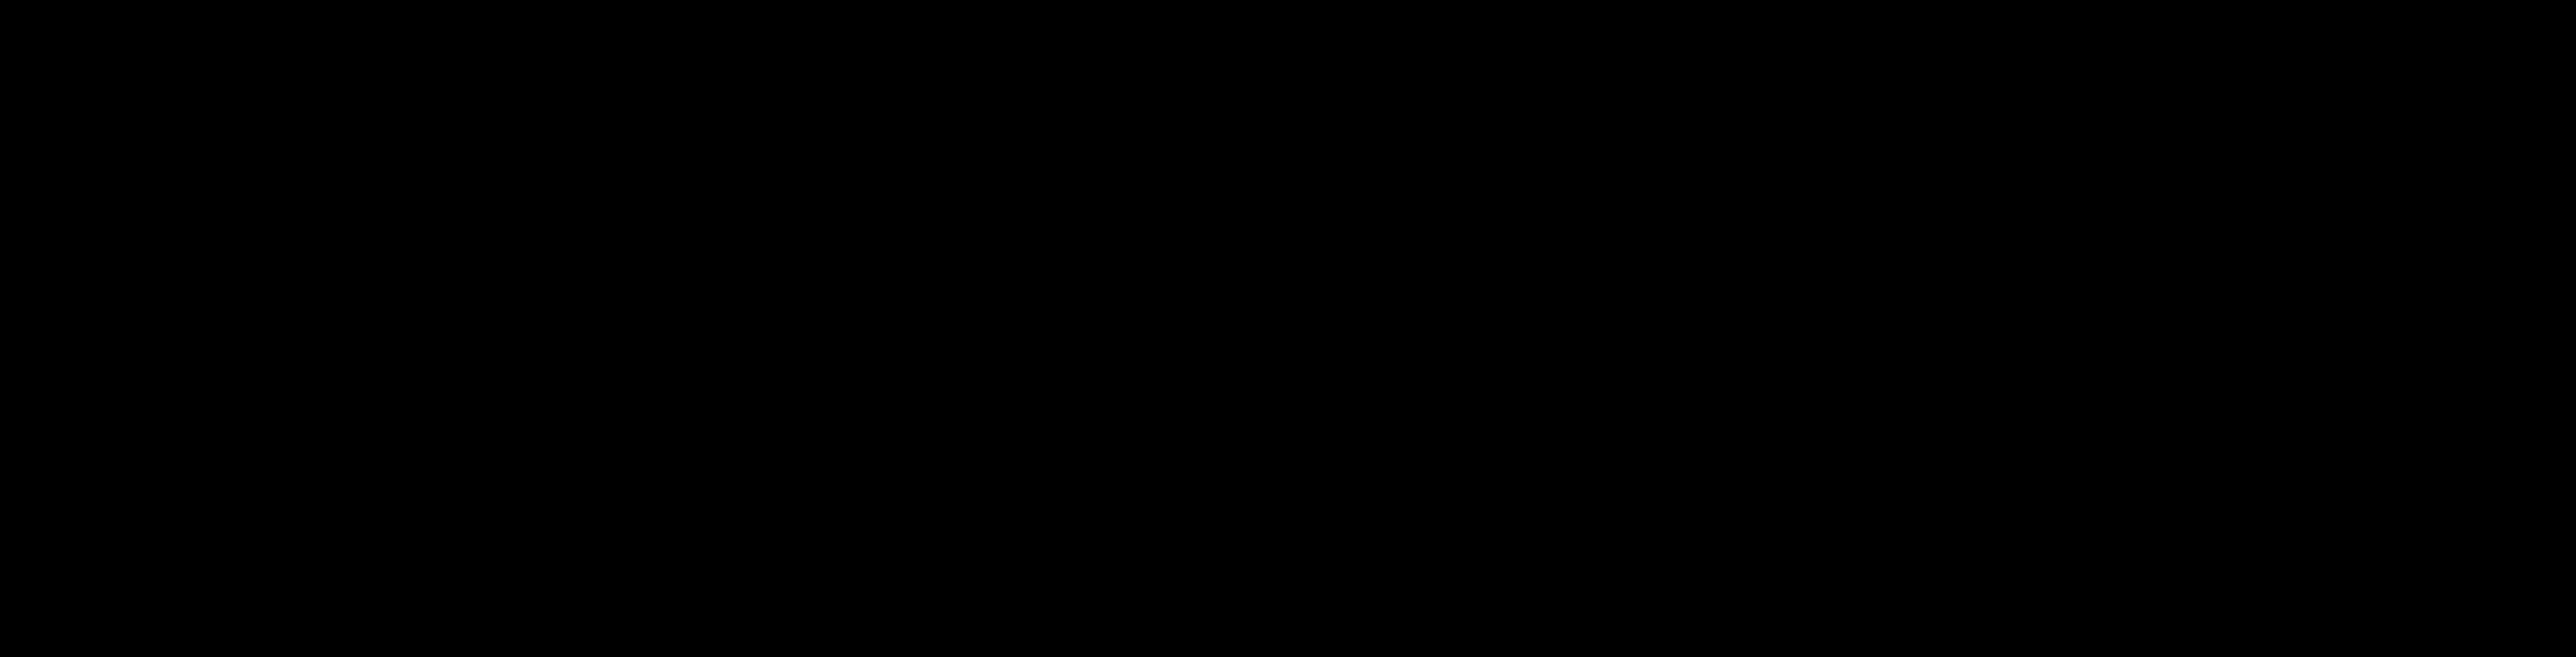 N2-t-Boc-N6-(biotinamido-6-N-caproylamido)lysine